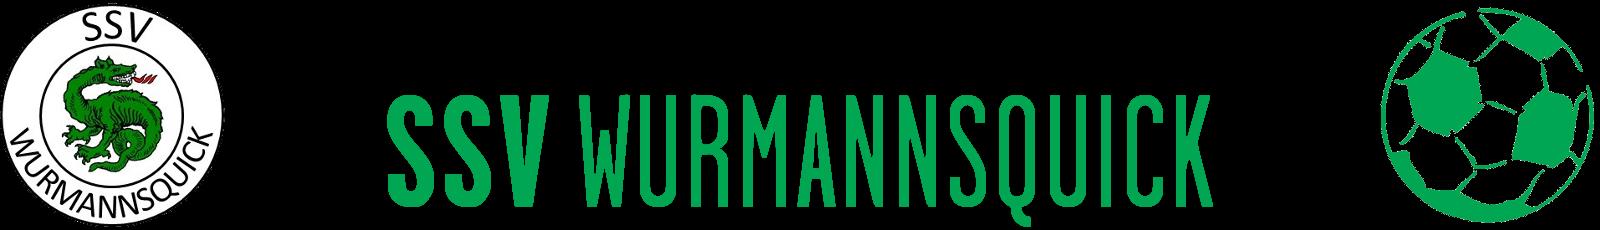 SSV Wurmannsquick Logo